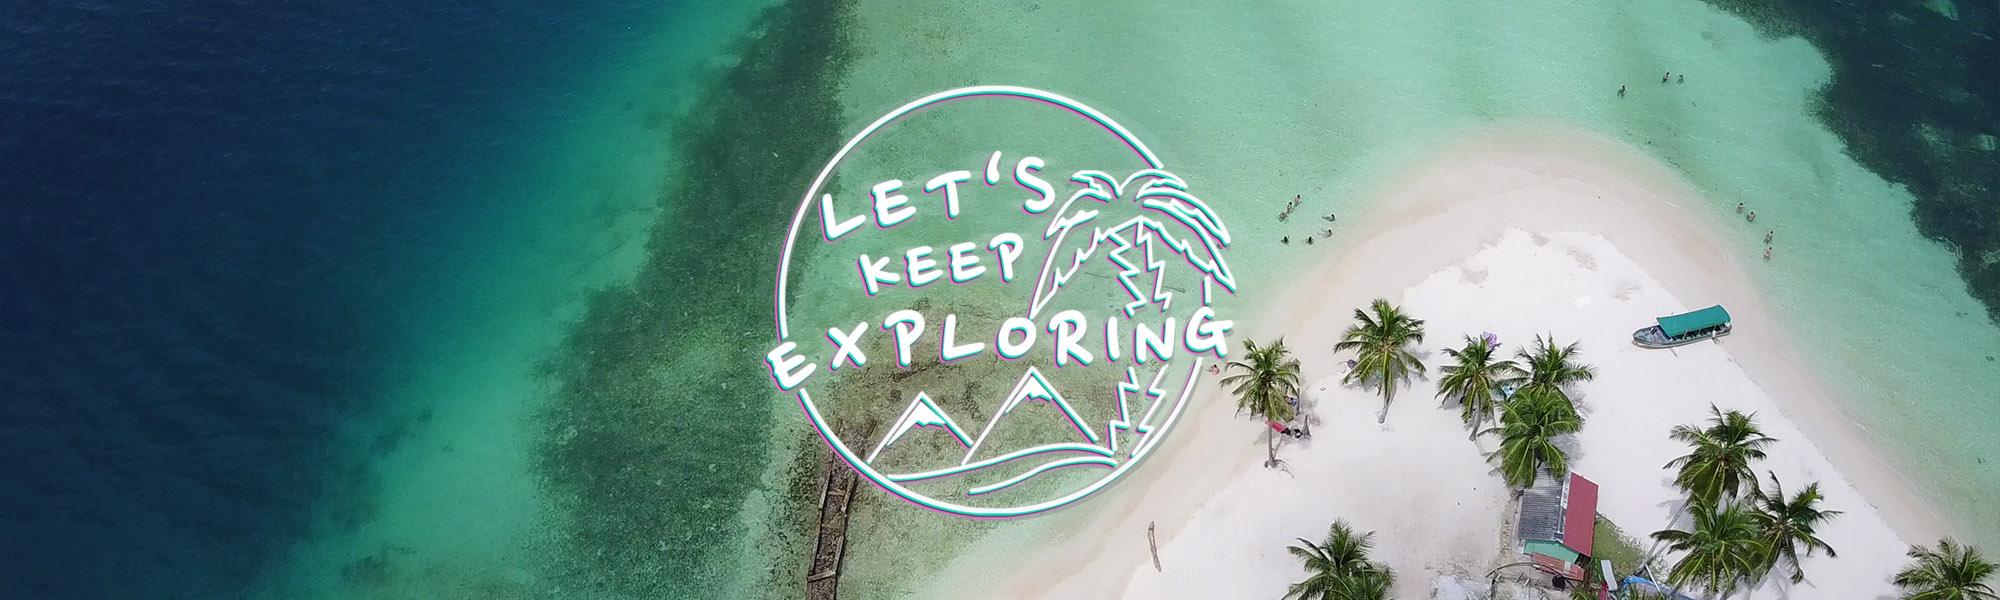 Lets Keep Exploring